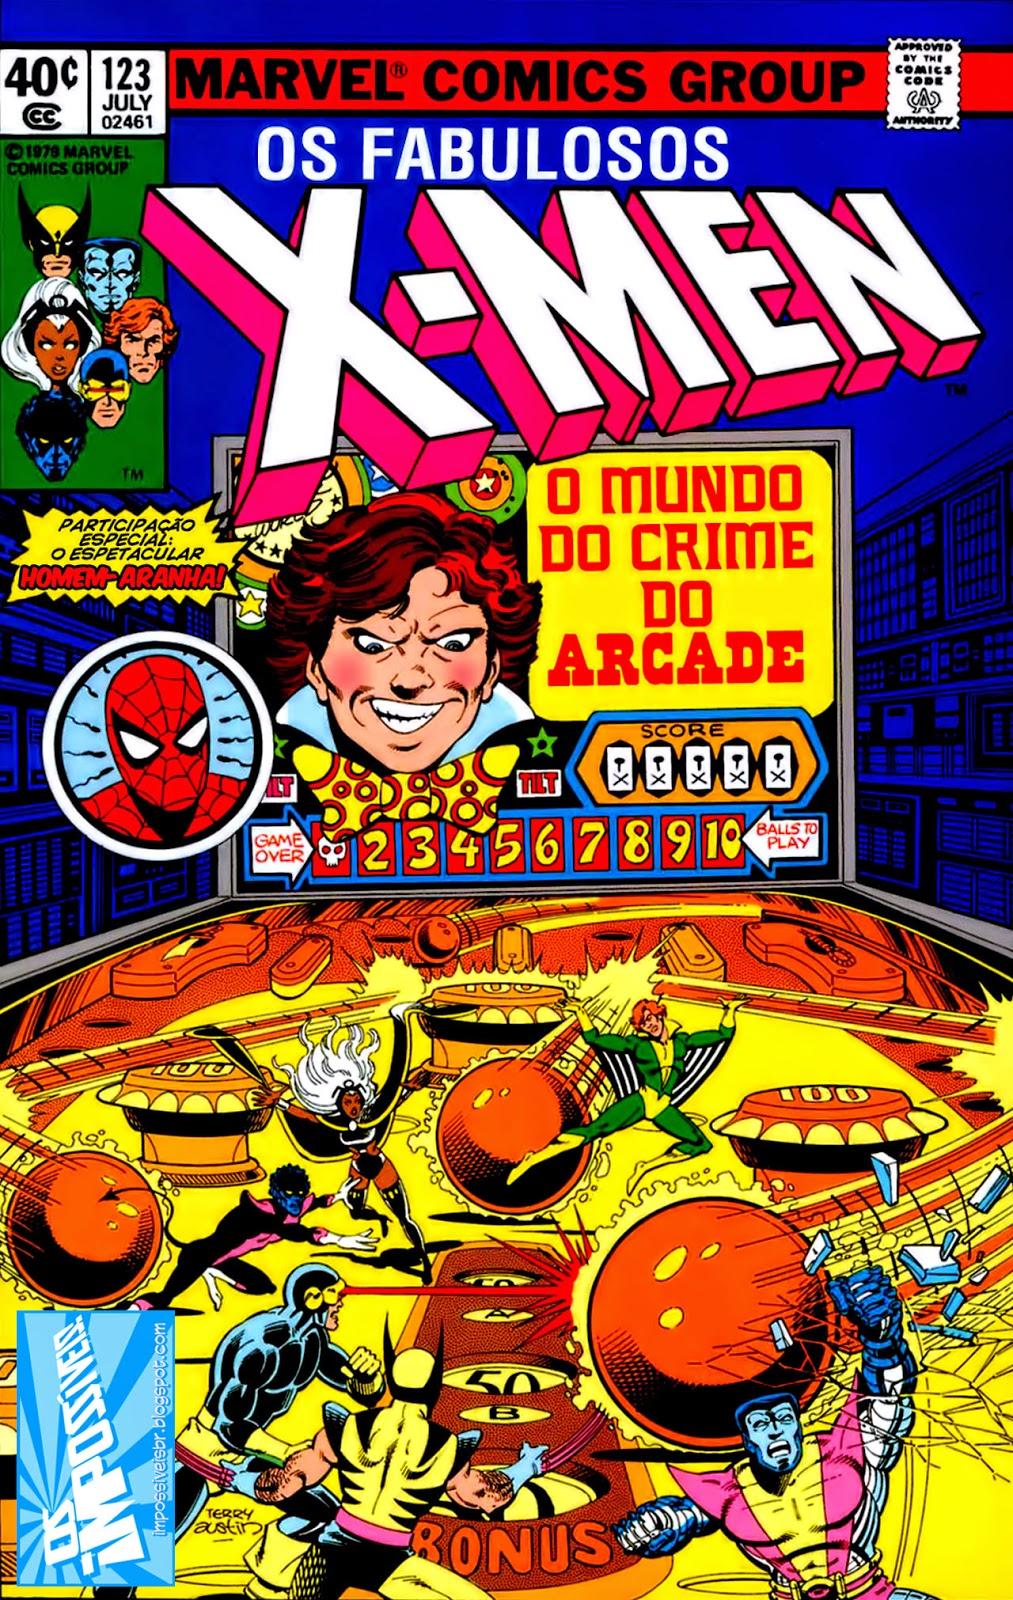 http://www.mediafire.com/download/tshu8axatu55yuc/Os.Fabulosos.X-Men.(X-Men.V1).123.HQBR.14NOV13.Os.Impossiveis.cbr